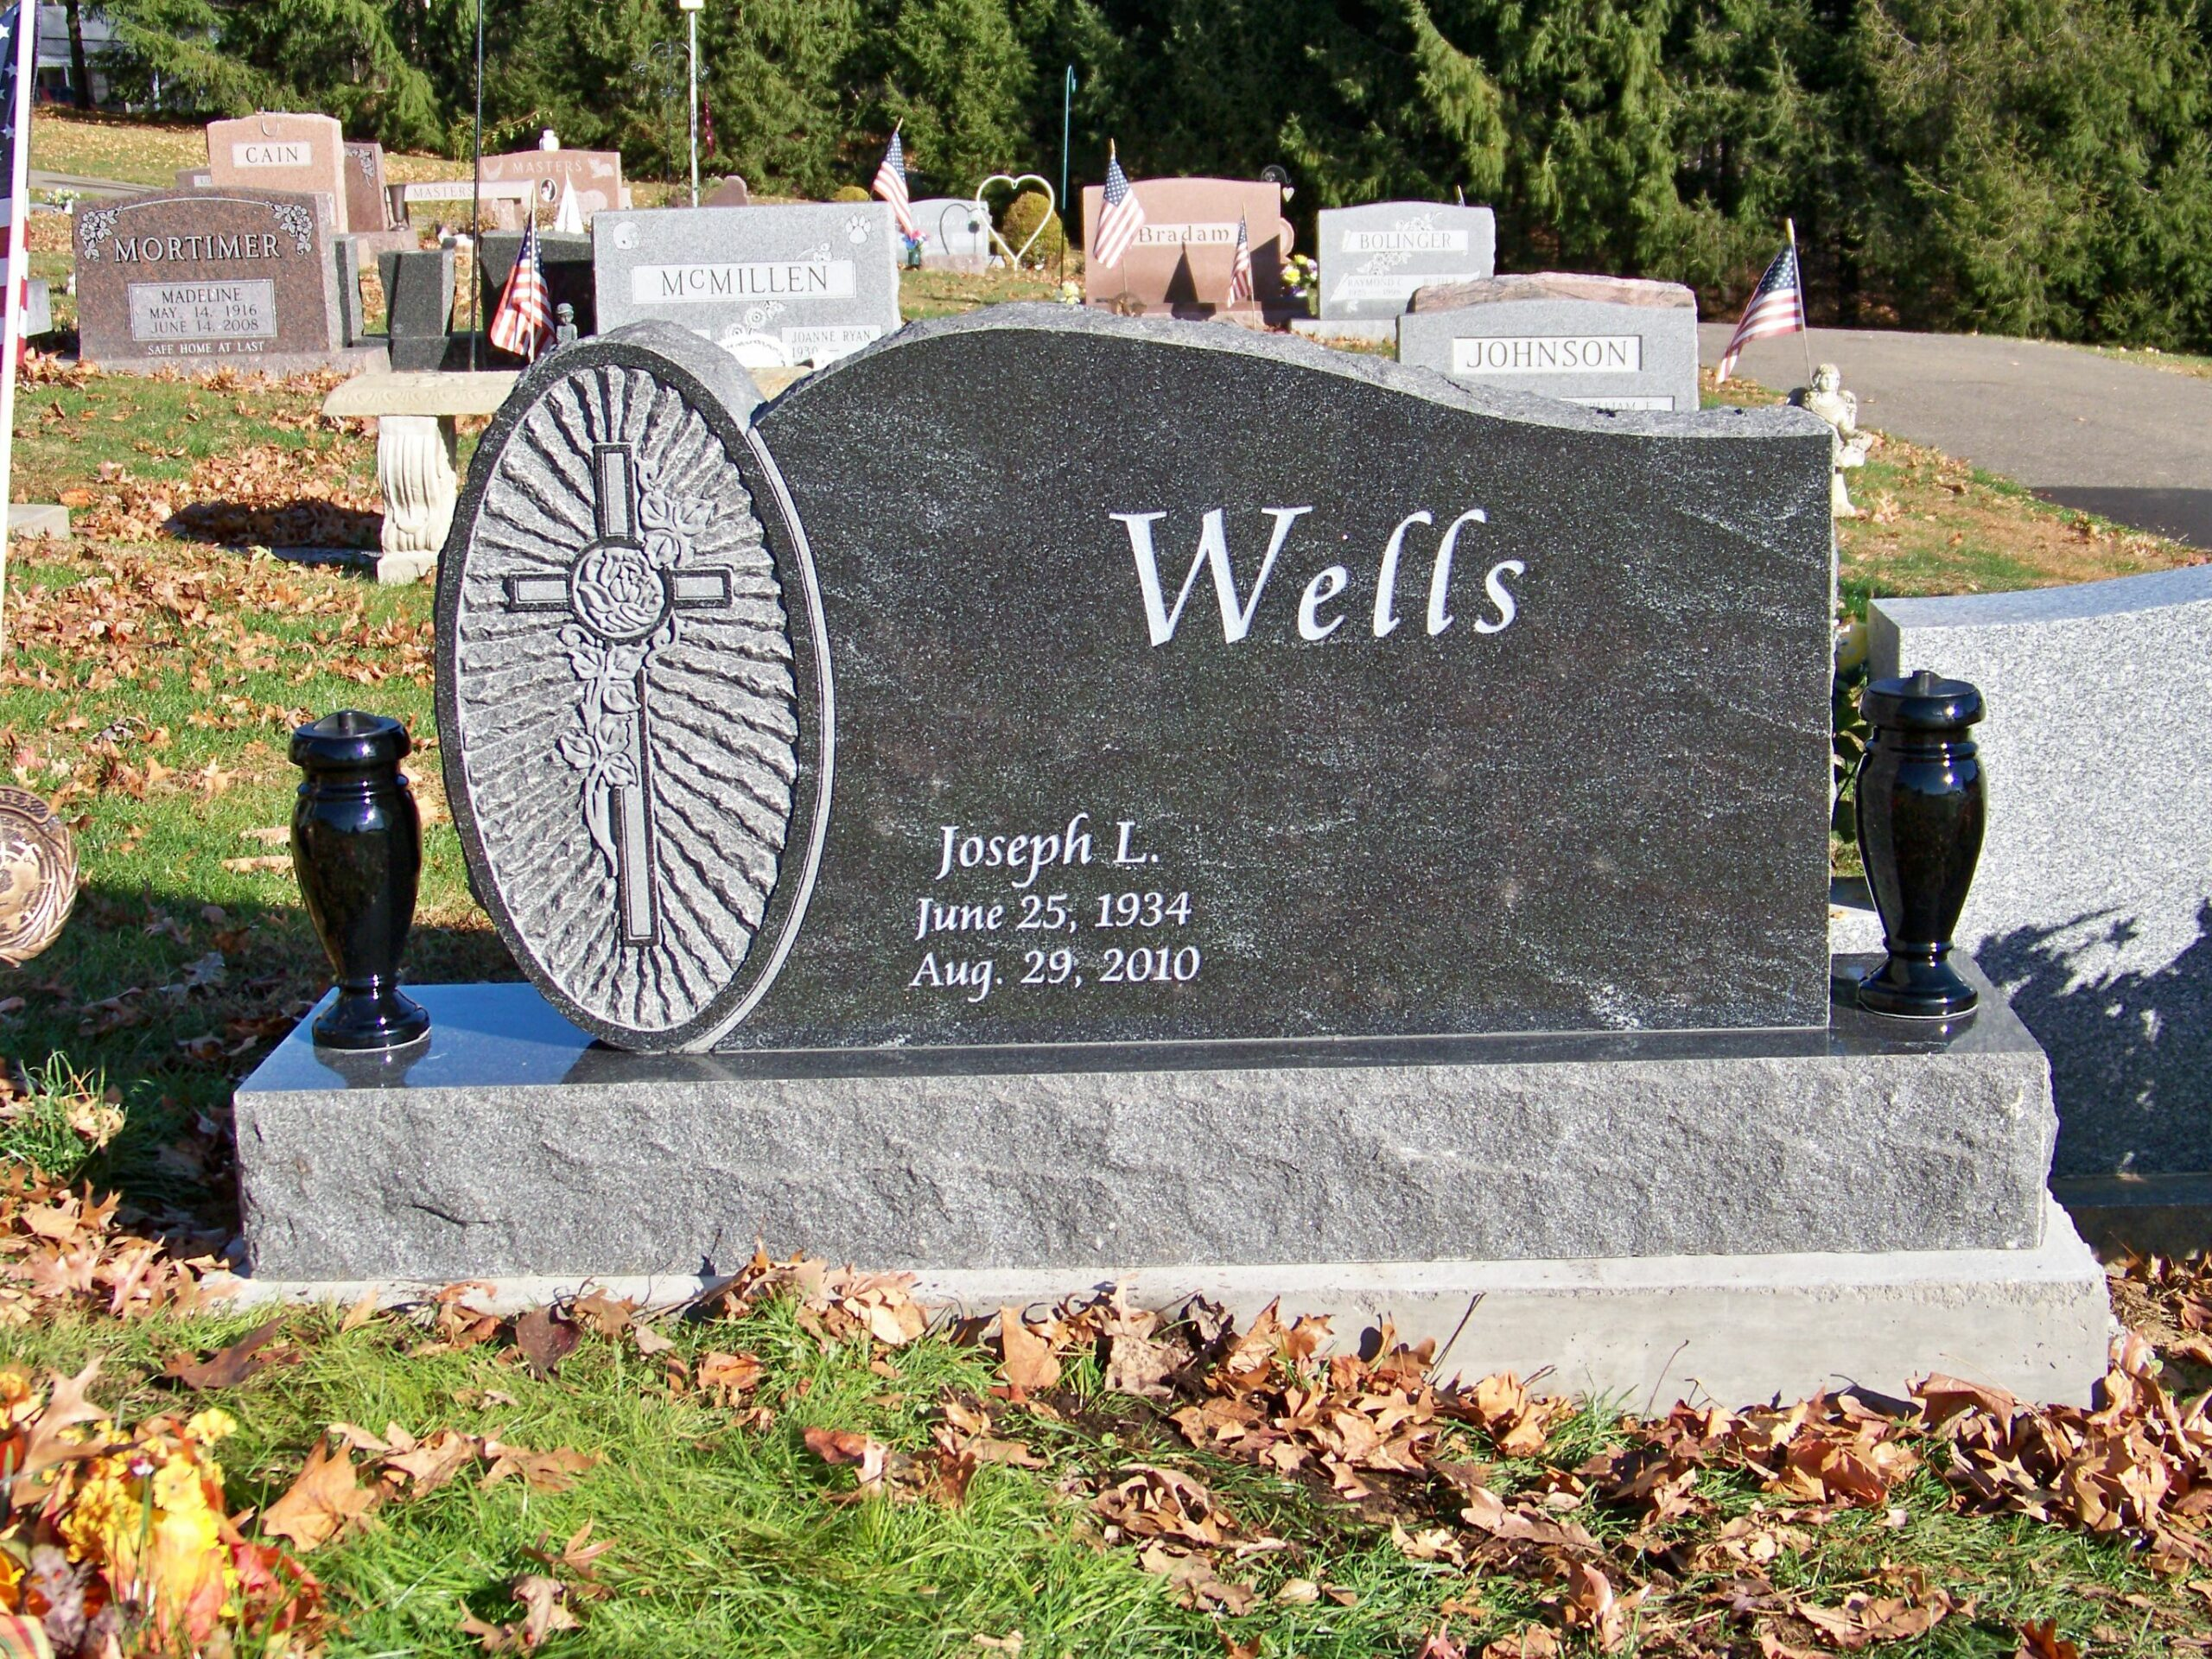 Wells, Joseph L.